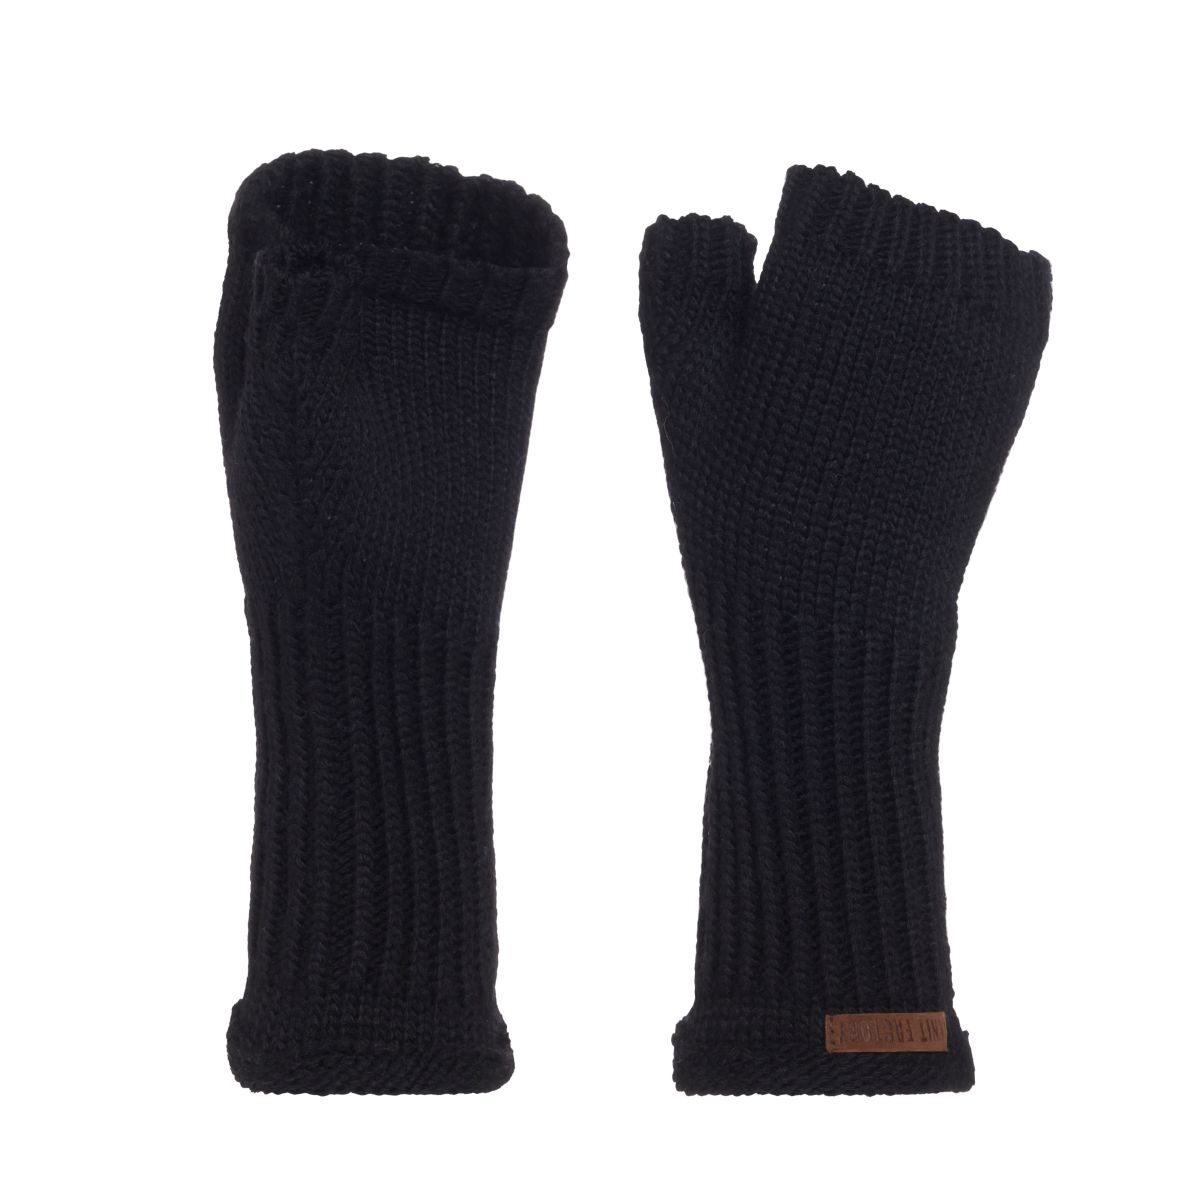 cleo gloves black